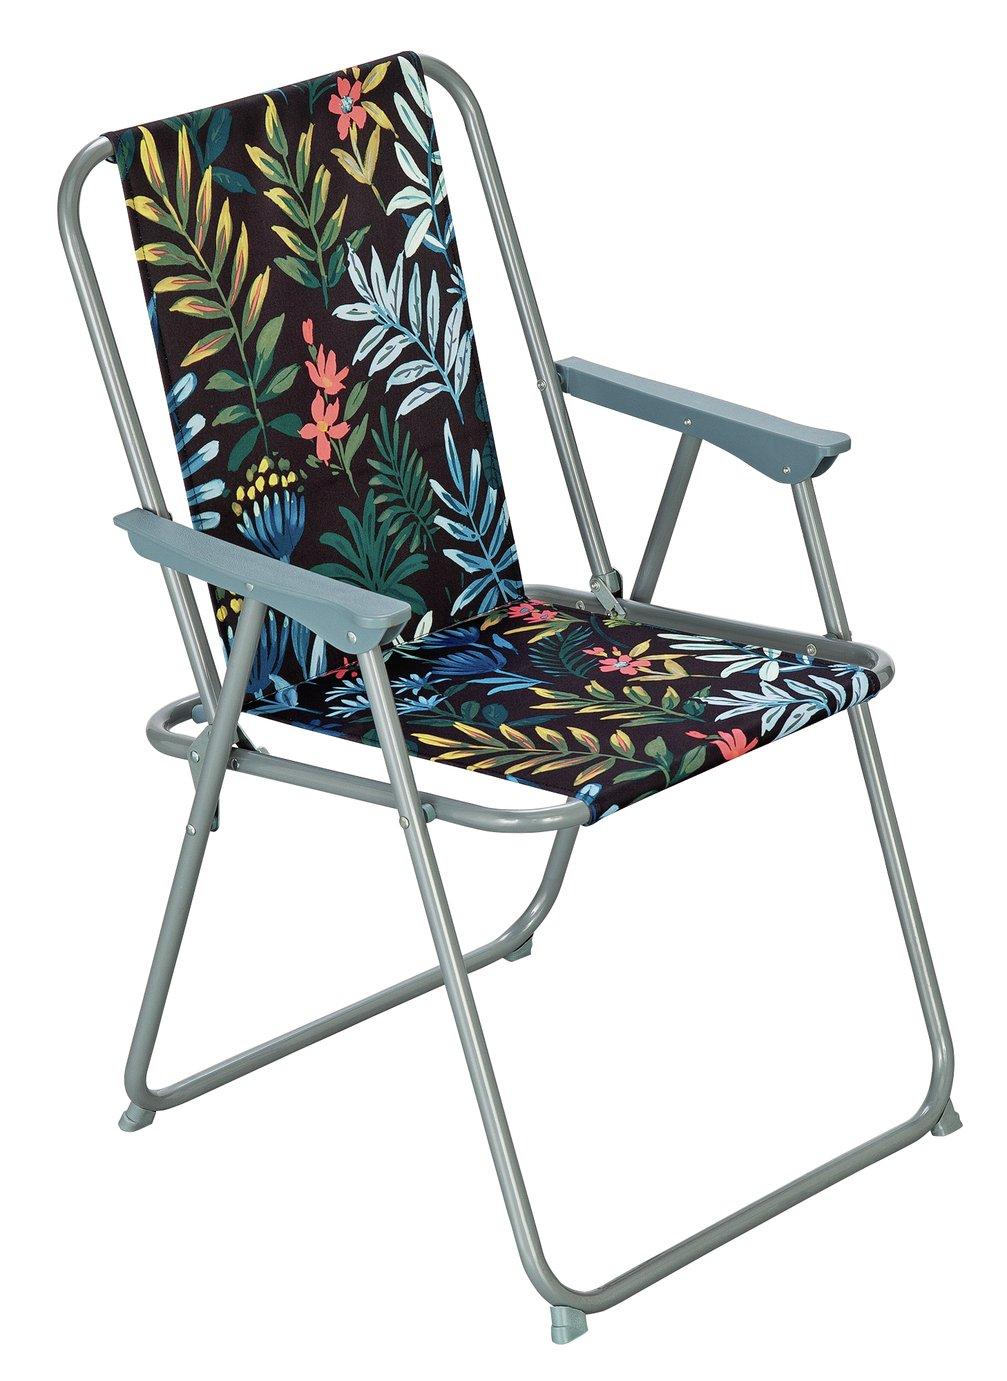 Argos Home Metal Folding Picnic Chair - Rainforest